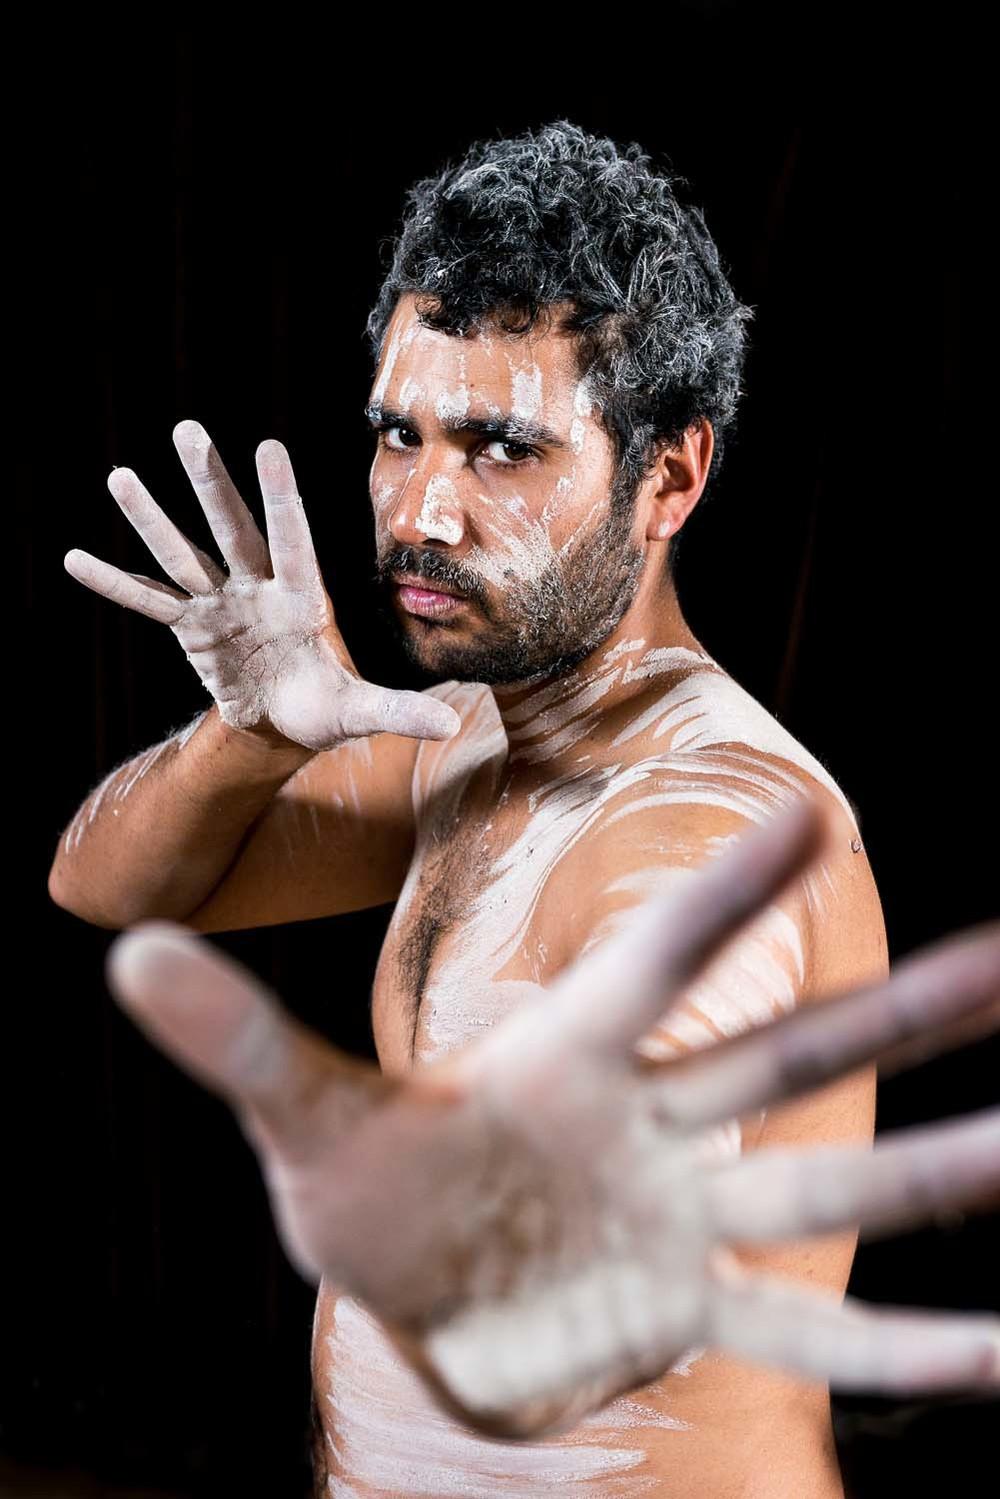 Melbourne Aboriginal Performer